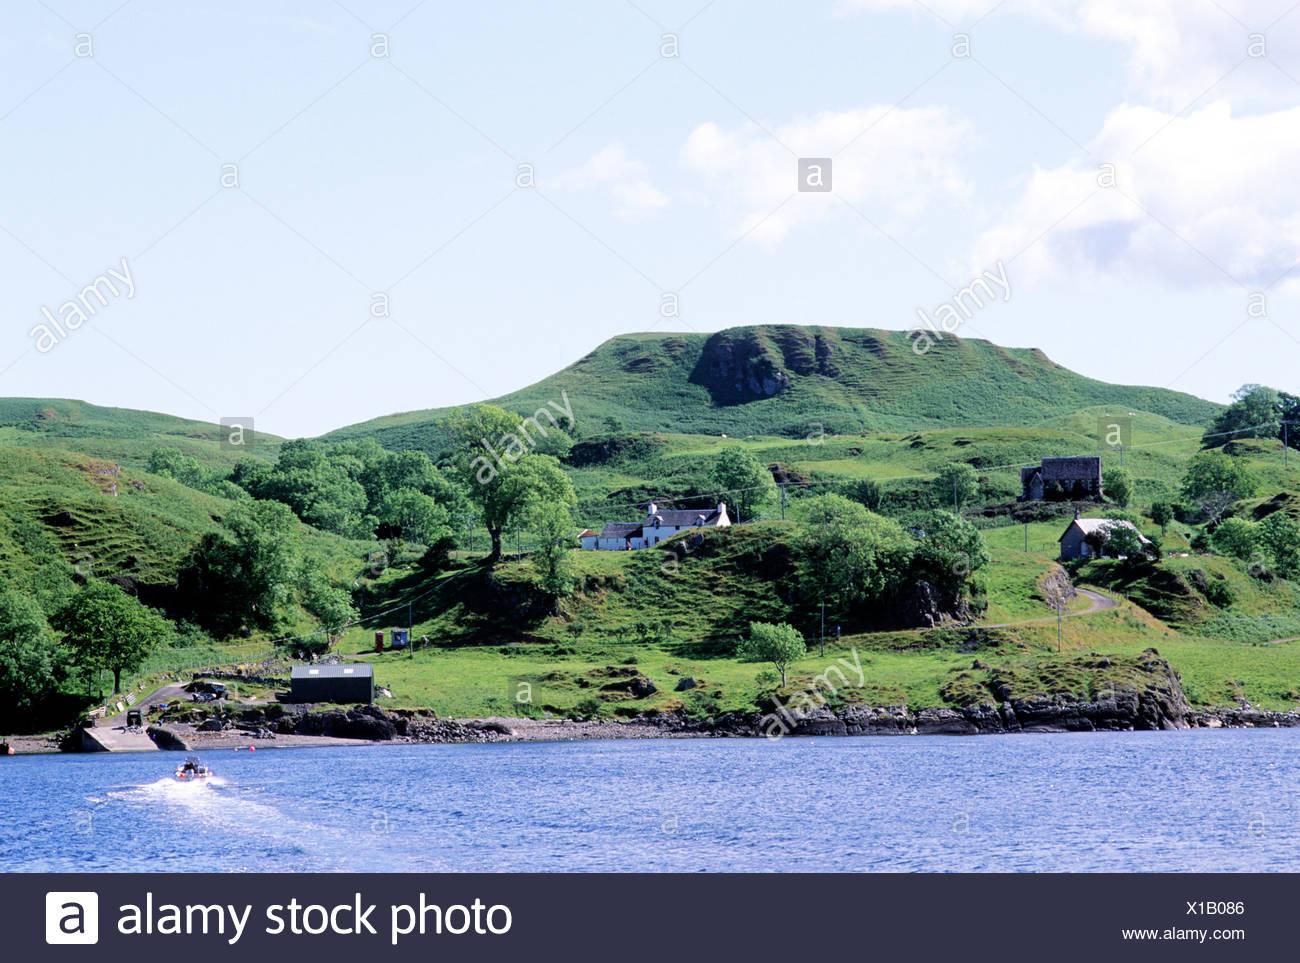 Kerrera Island, ferry from Oban, Scotland Scottish islands coast coastal scenery UK - Stock Image